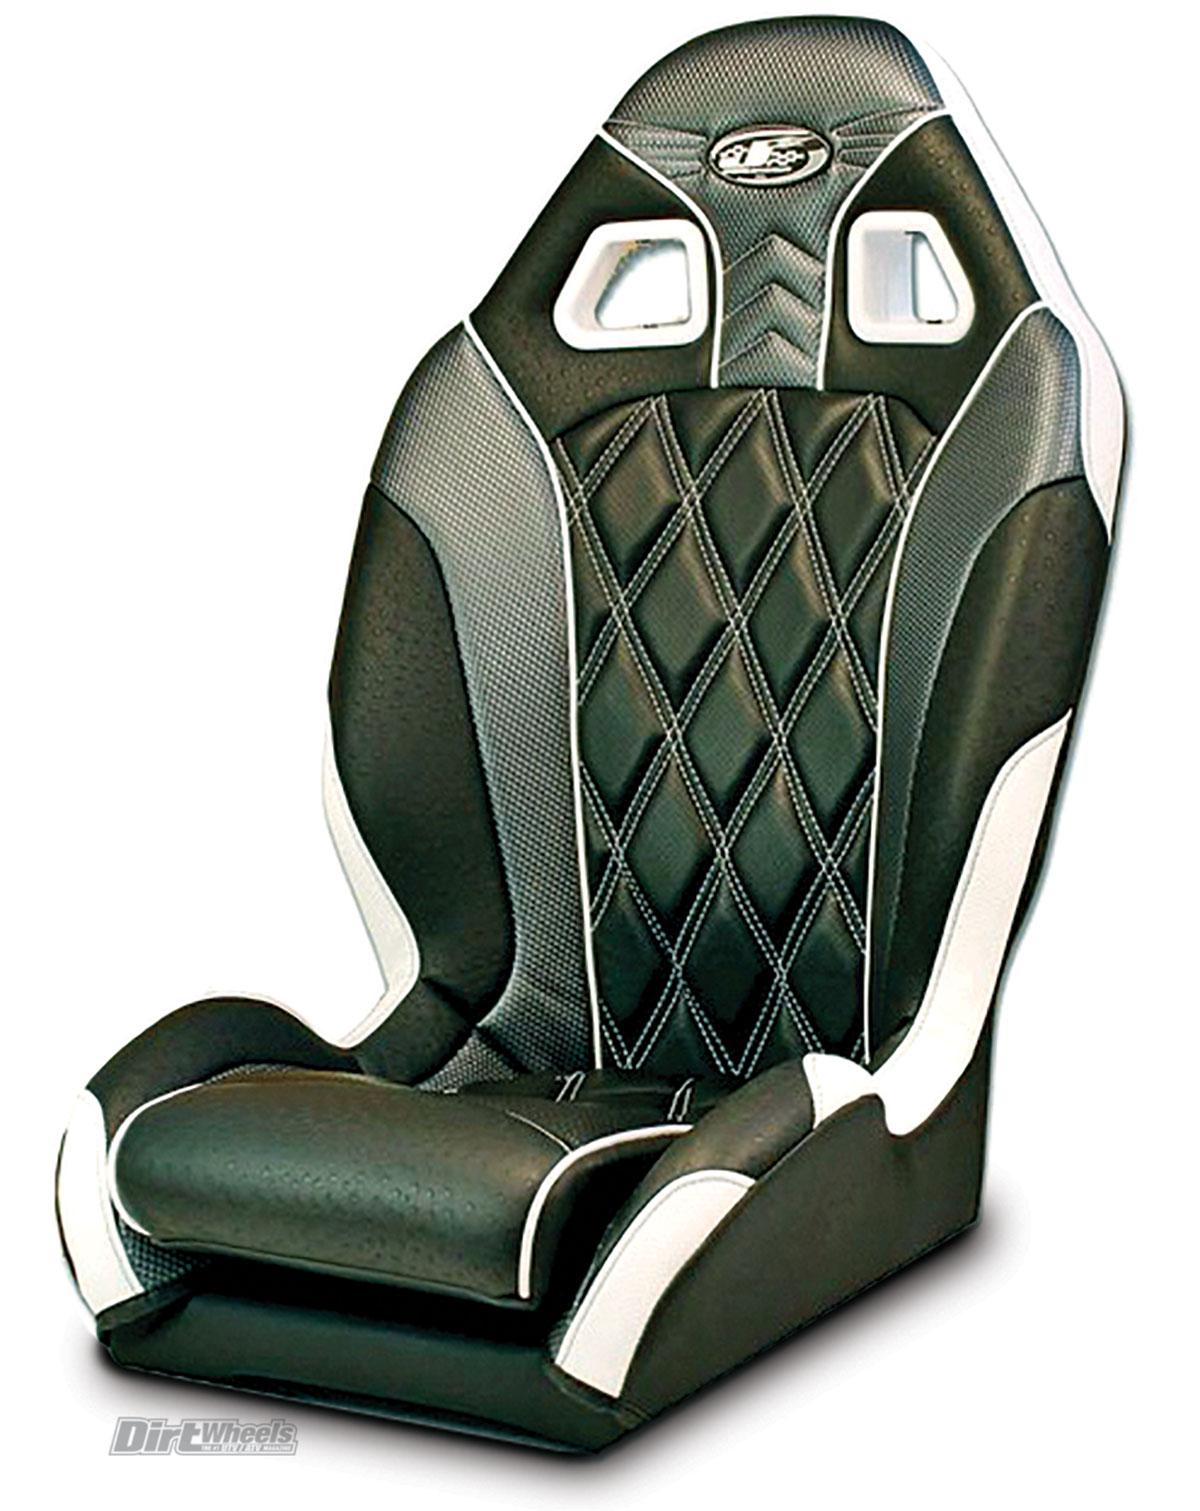 Polaris RZR Suspension Seats , Black Bucket Seats With 4 Point Harnesses